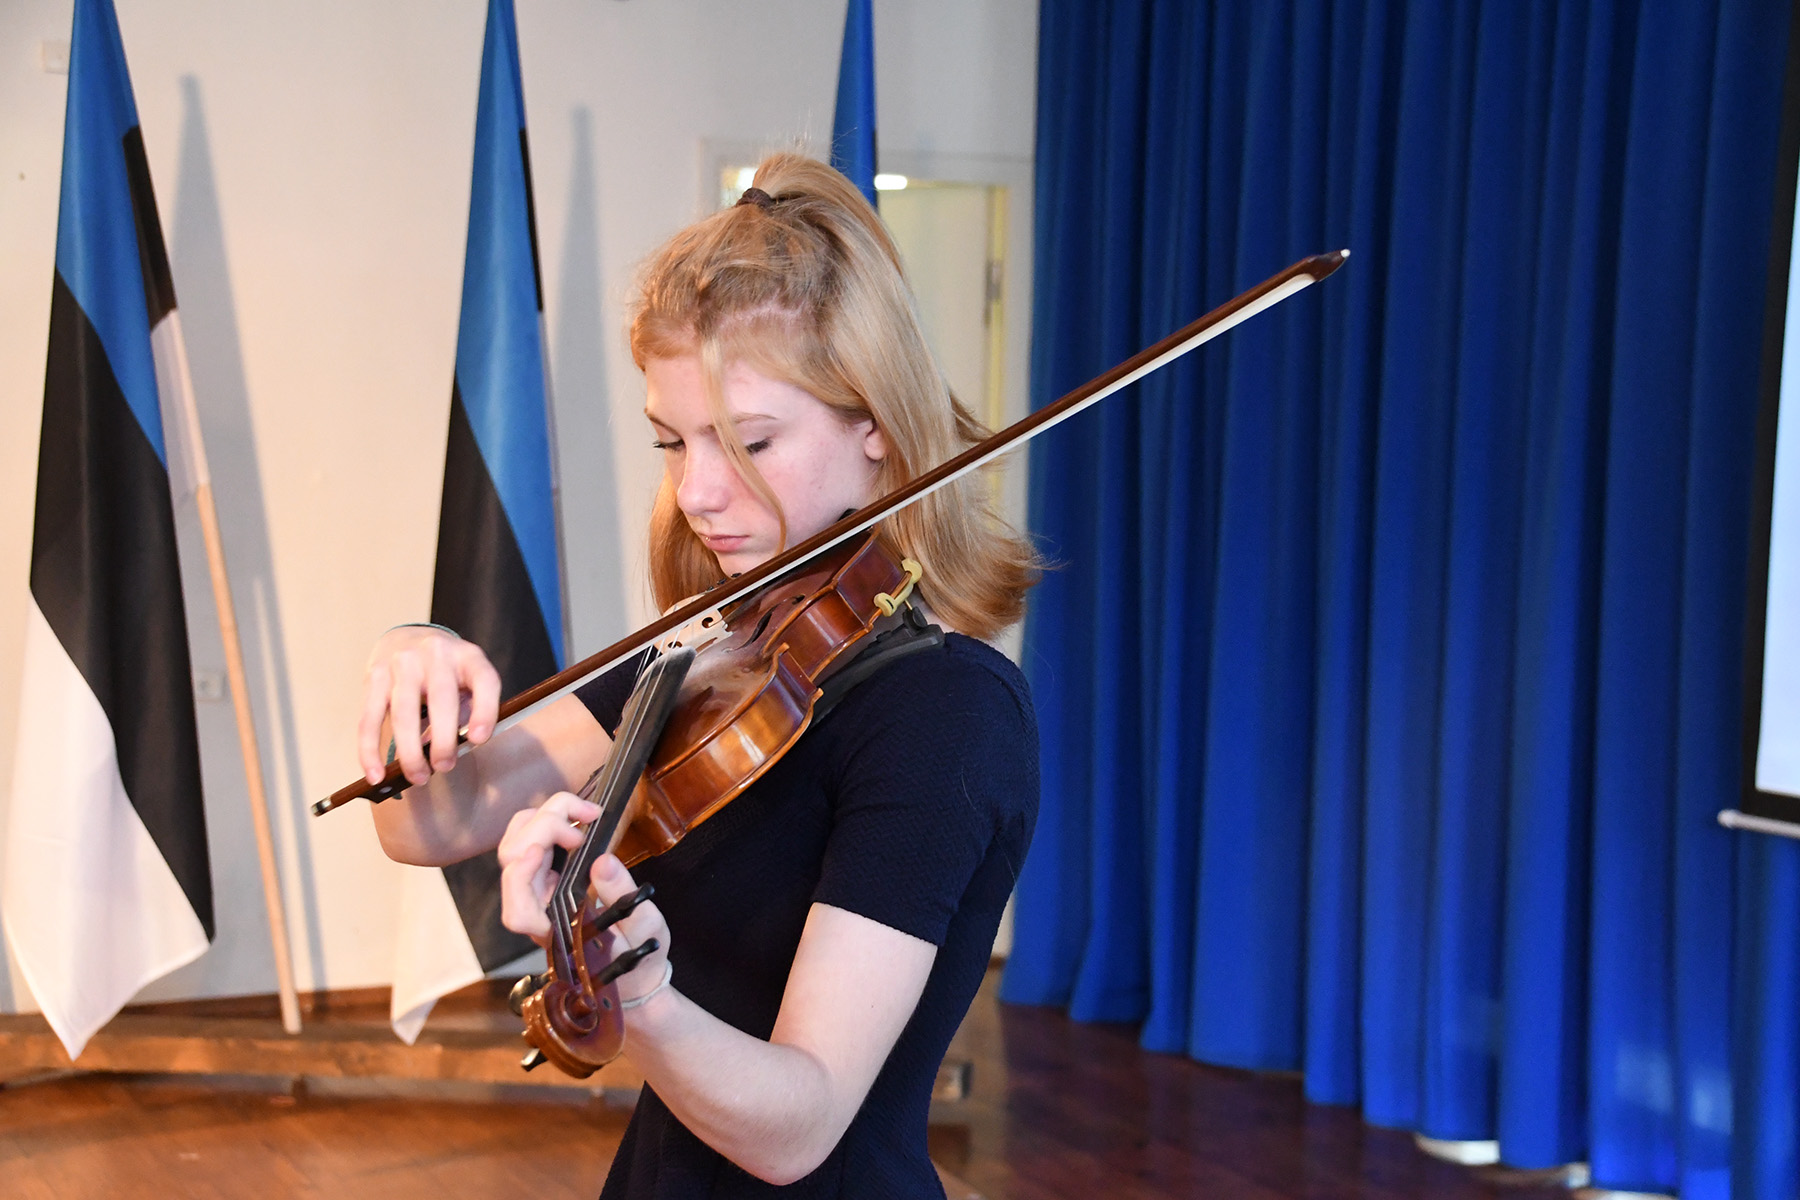 Kertu Kirke Hansen mängib Sindi gümnaasiumi õpilaskonverentsil viiulipala Eesti lipp. Foto Urmas Saard